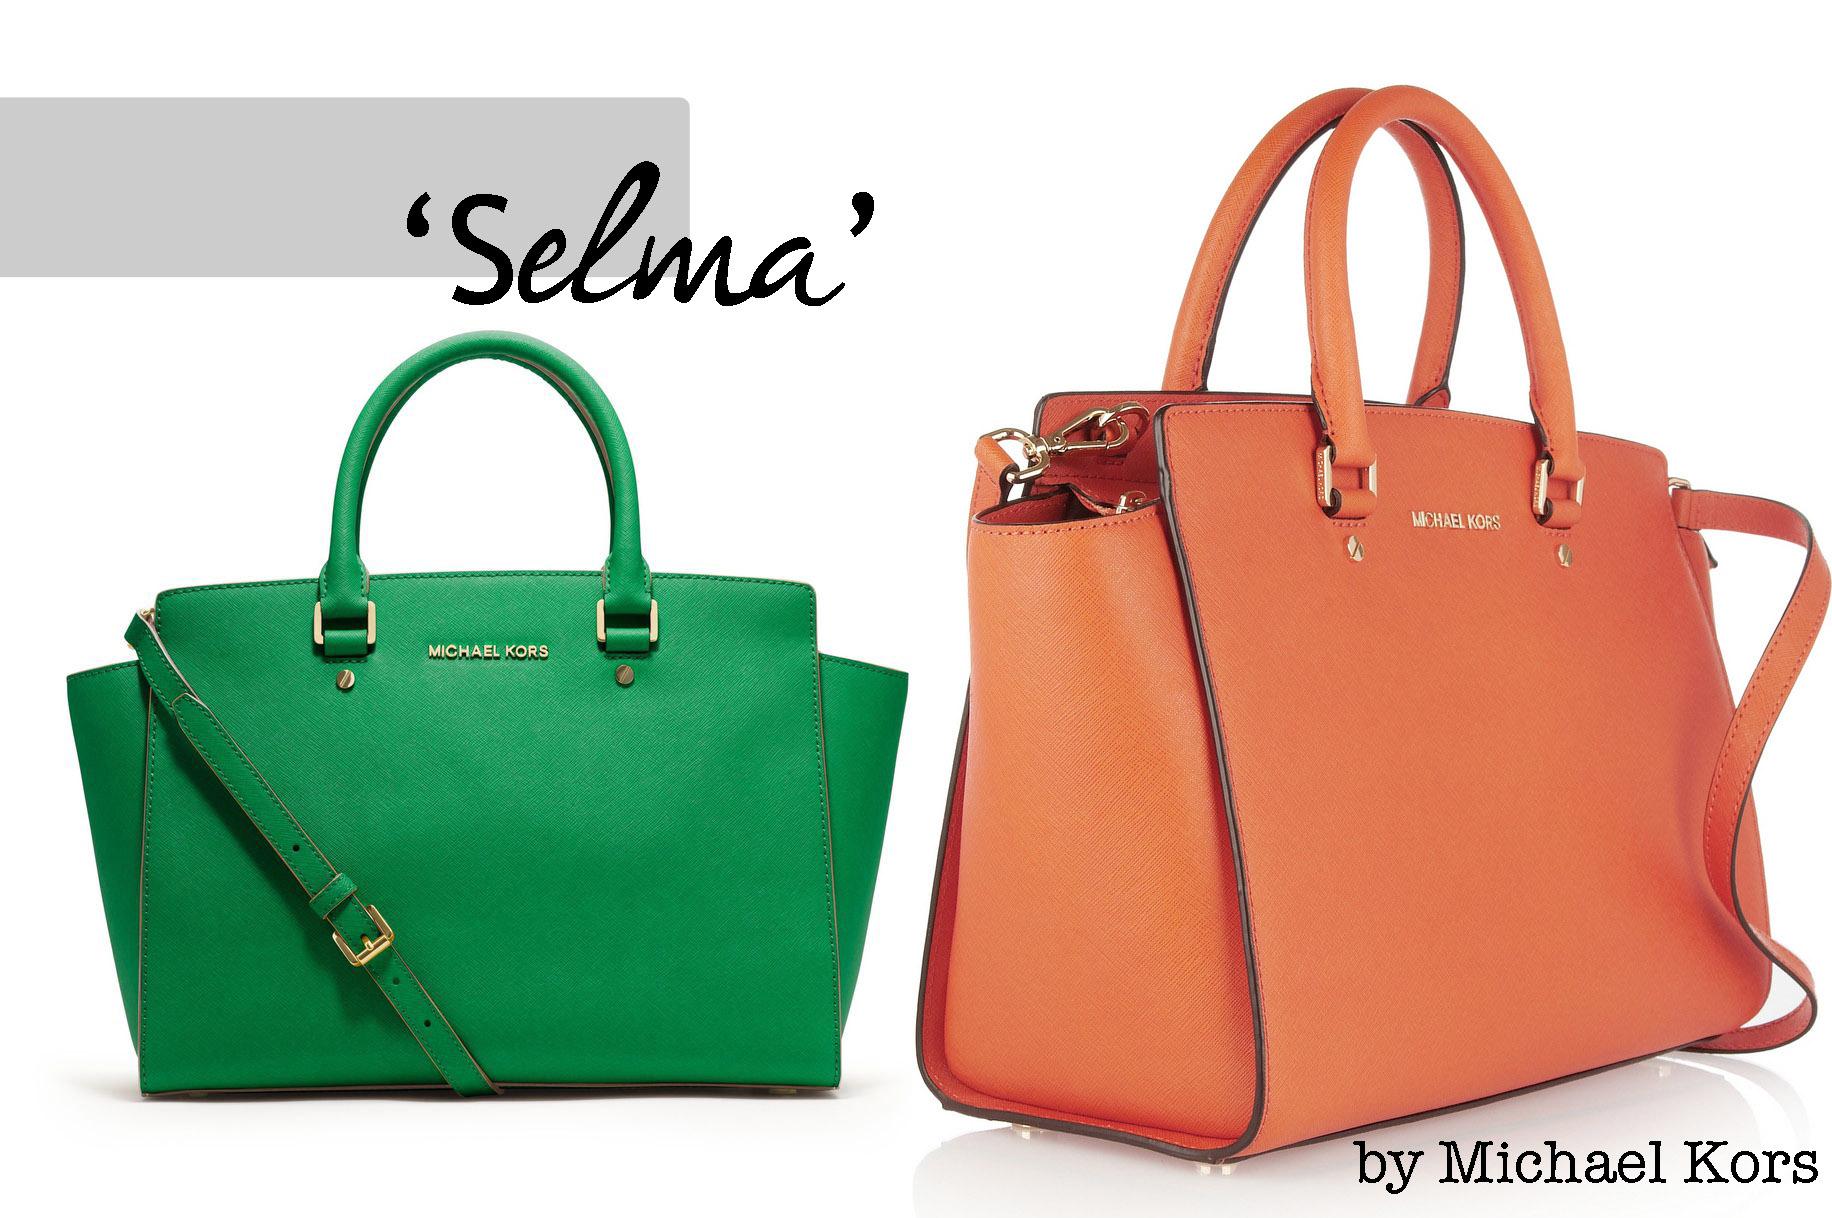 771082bdfcc5 ... where can i buy selma michael kors bag 7f04b 9d268